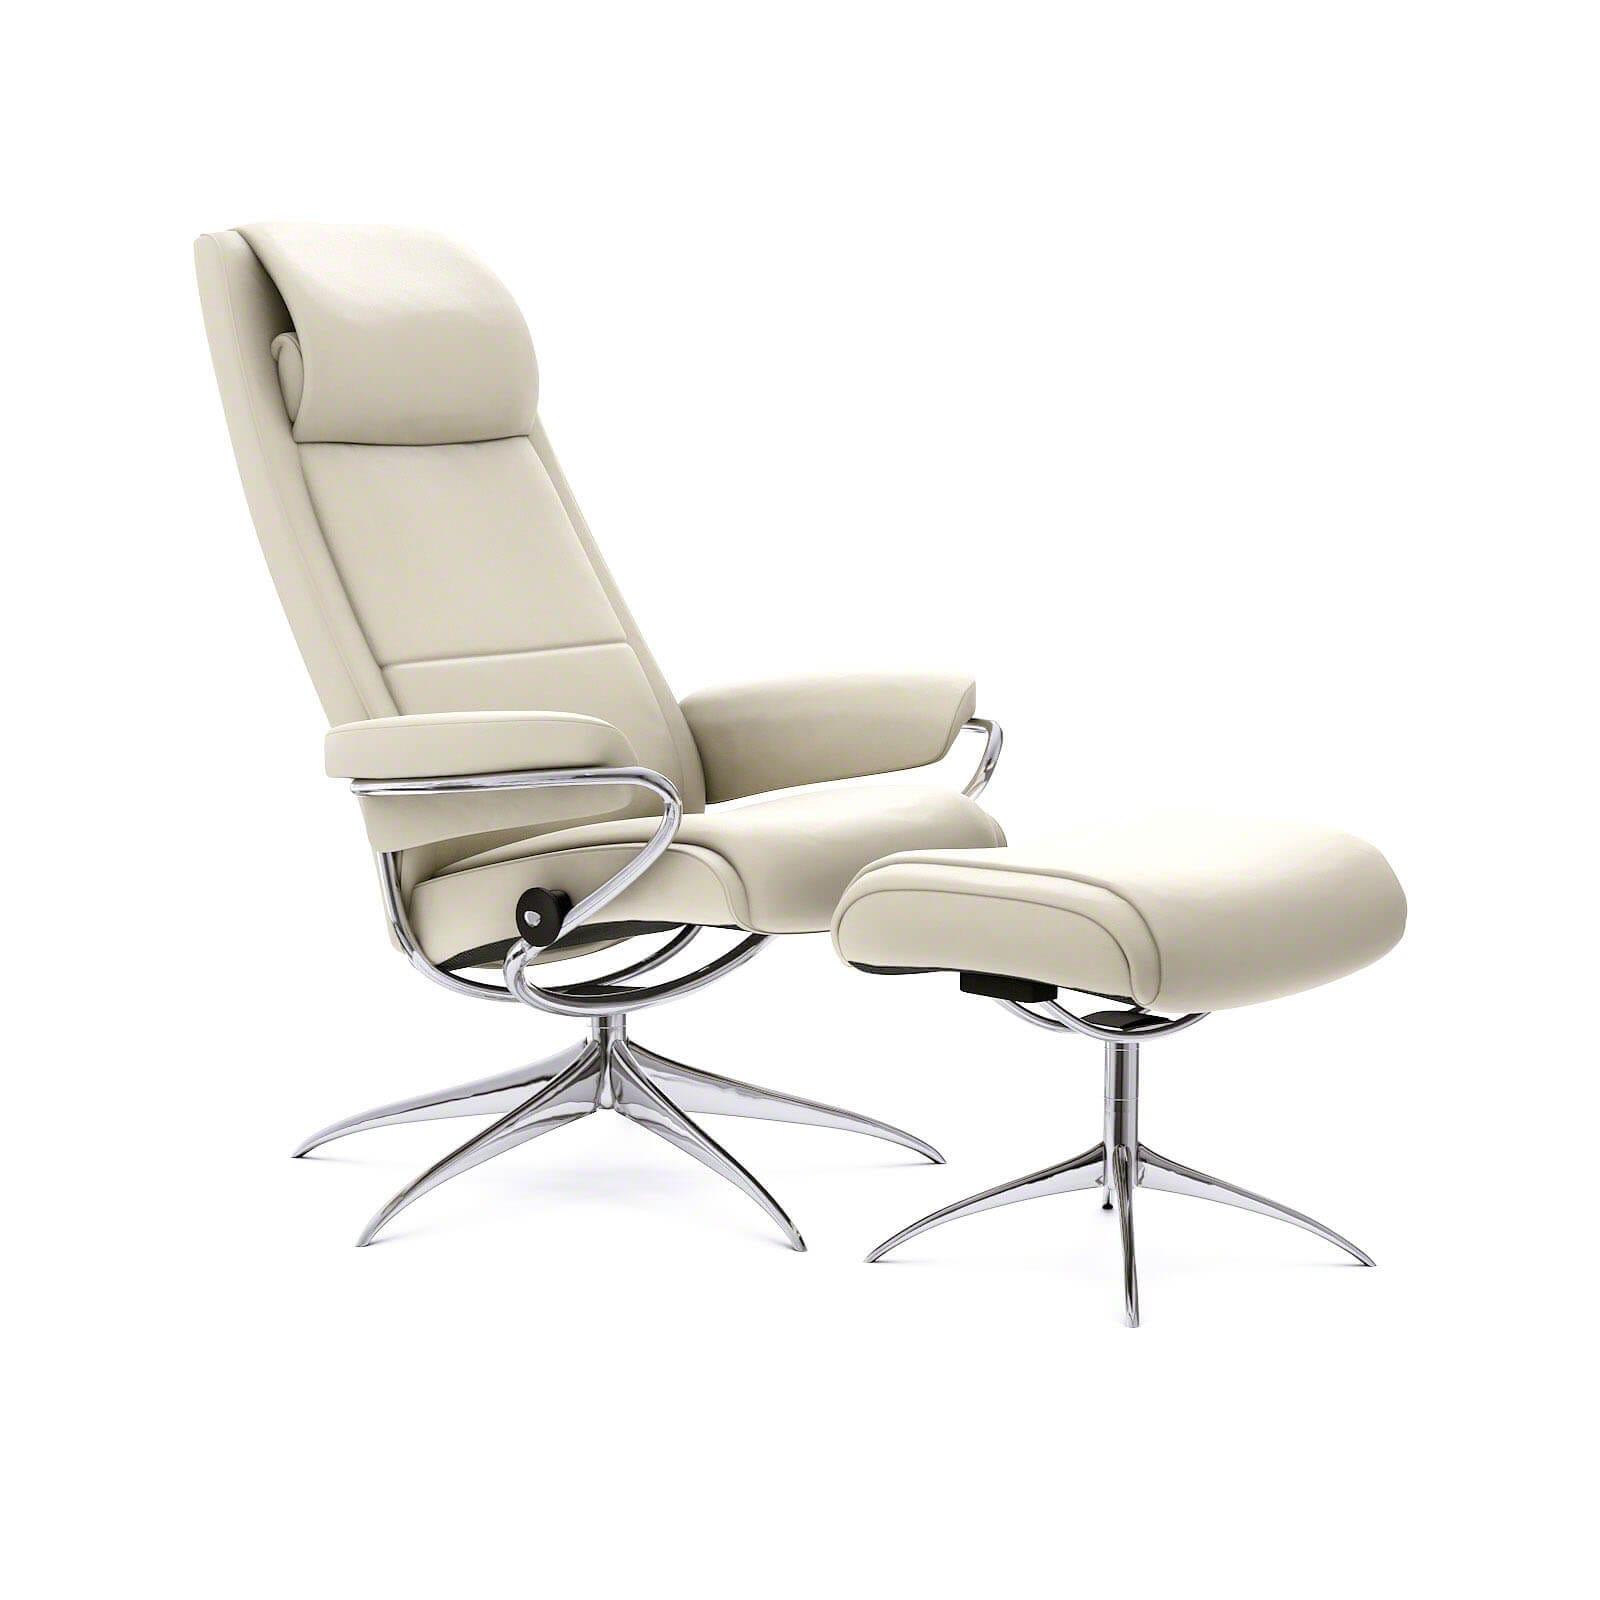 stressless paris sessel paloma light grey mit hoher lehne. Black Bedroom Furniture Sets. Home Design Ideas